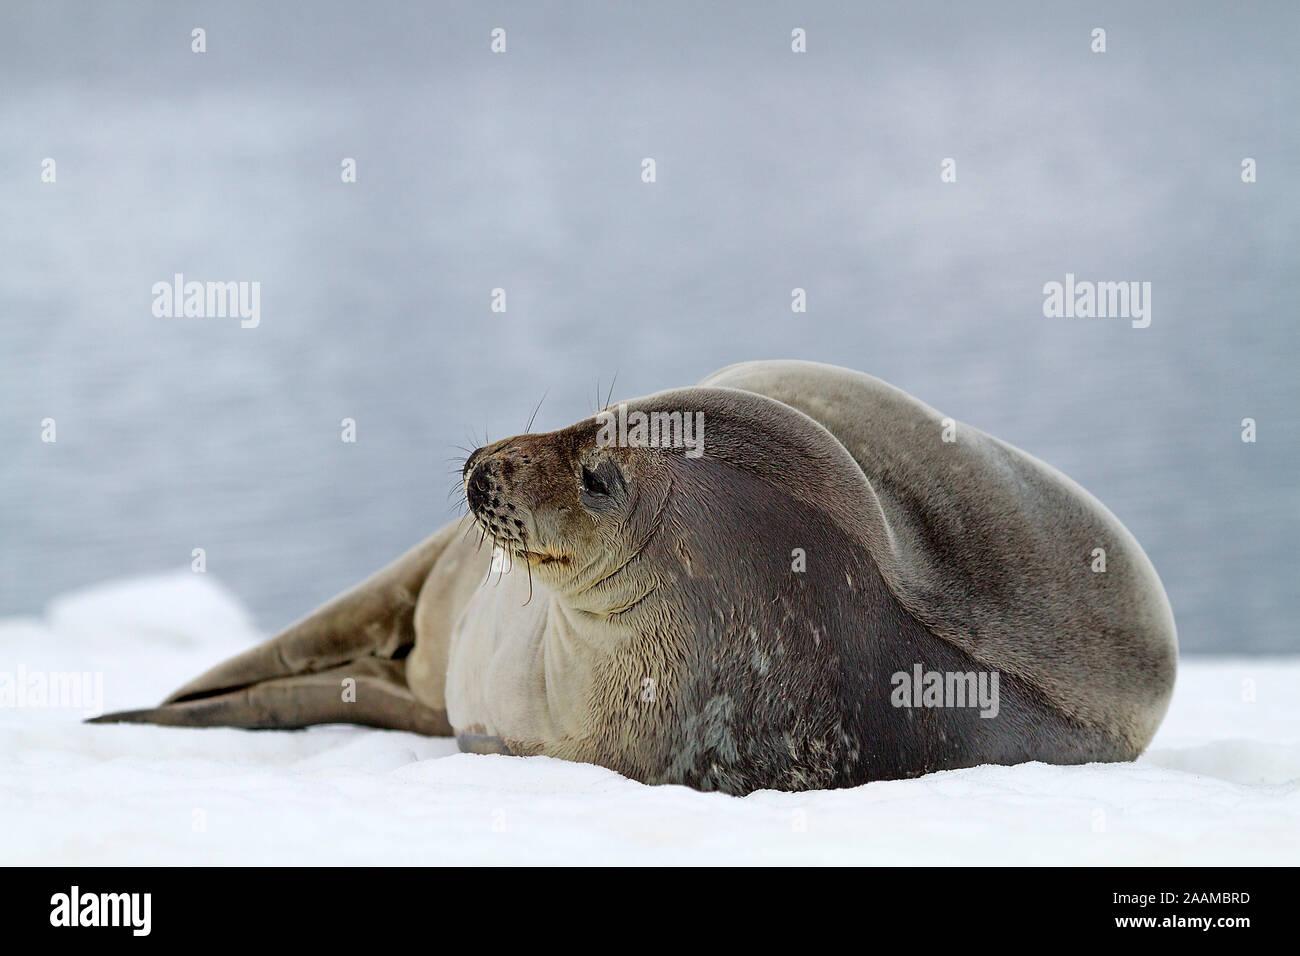 Weddelrobbe Stock Photo